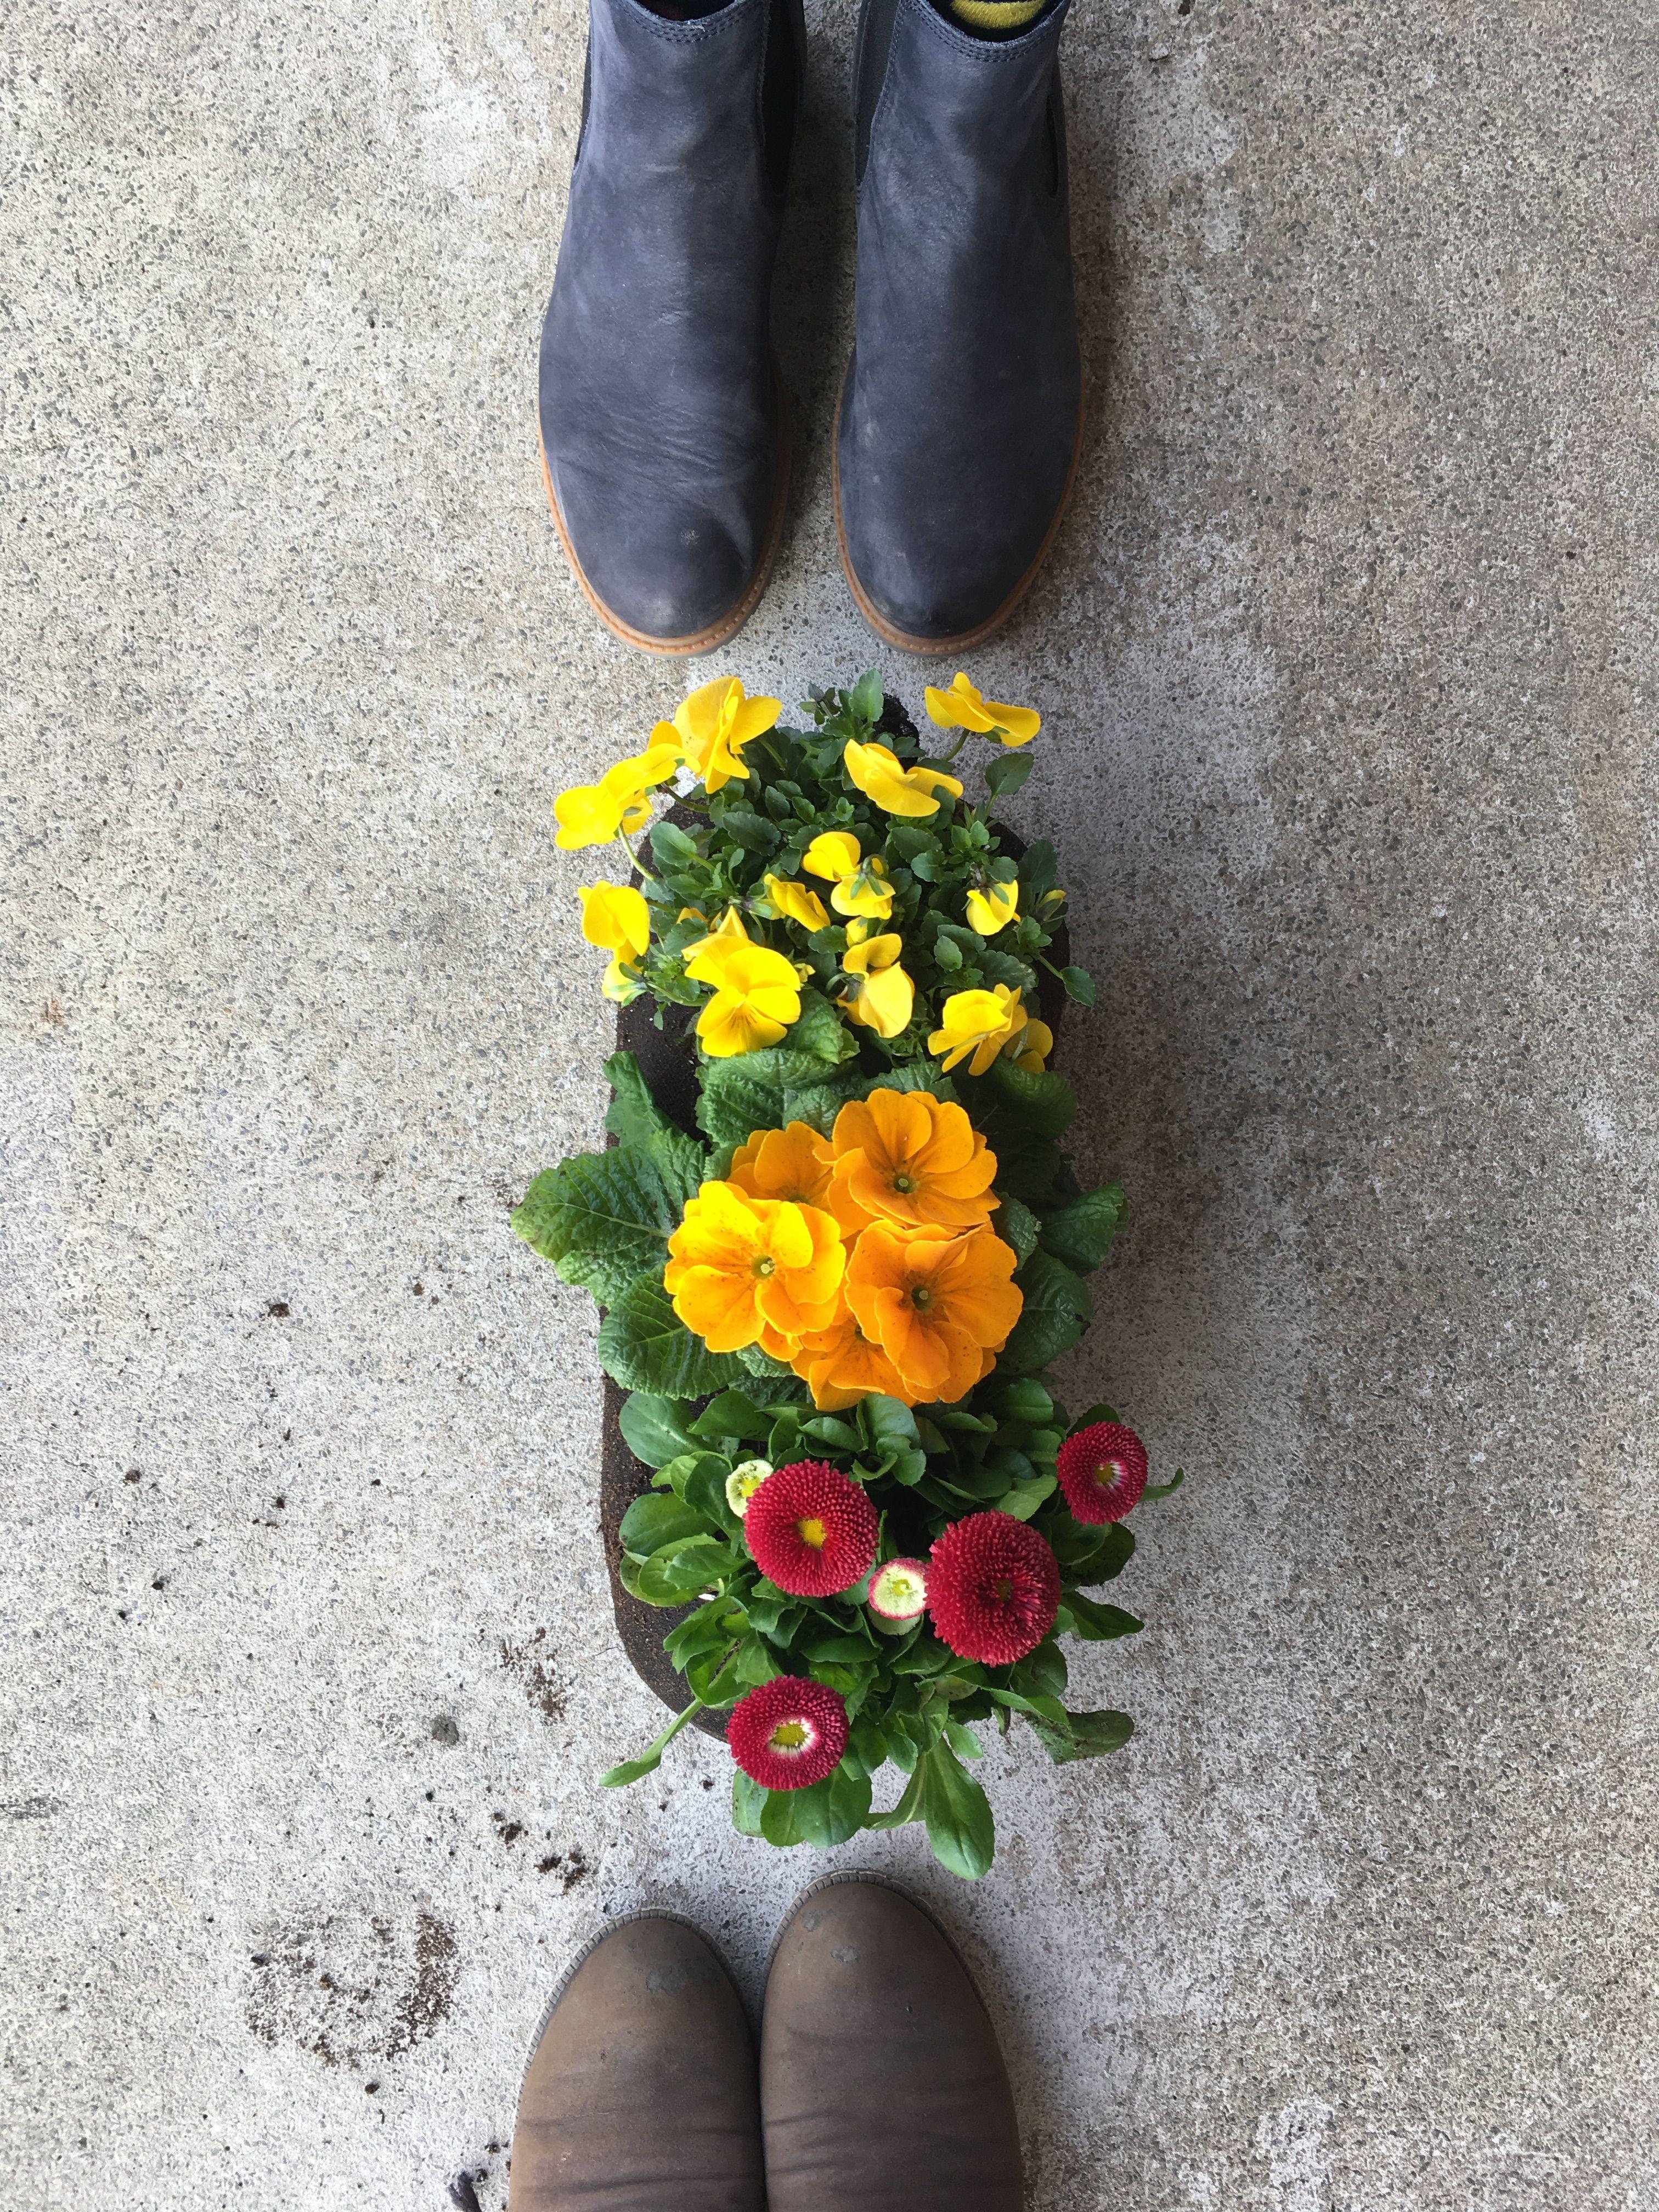 Fruhlingsblumen Fruhlingsblumen Blumen Und Fruhling